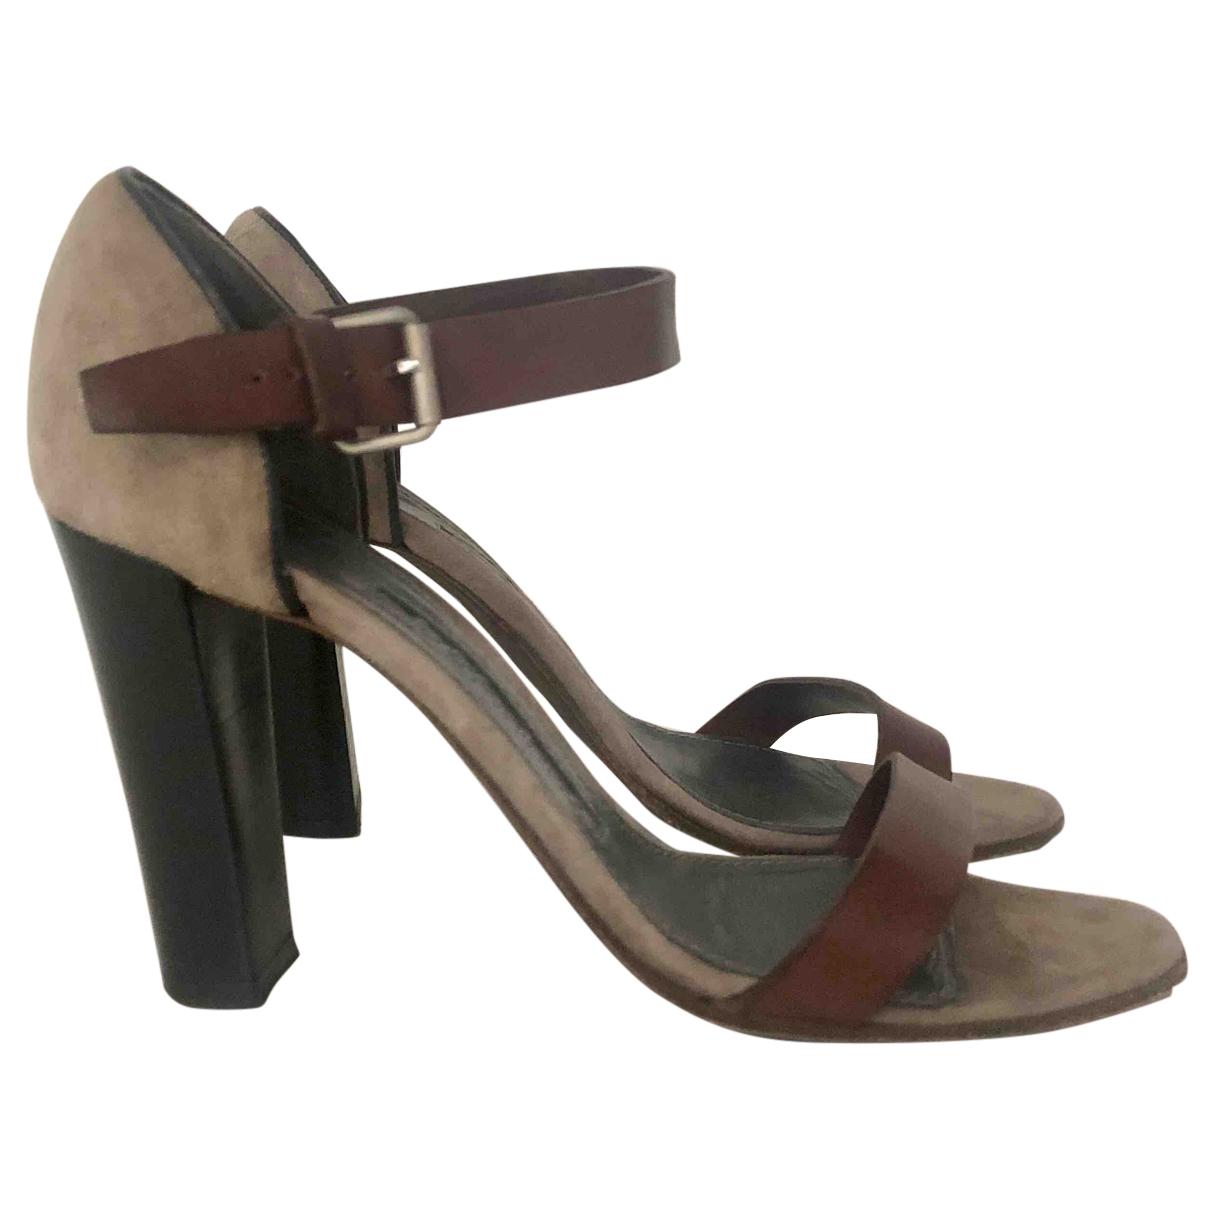 Proenza Schouler \N Brown Leather Sandals for Women 37.5 EU